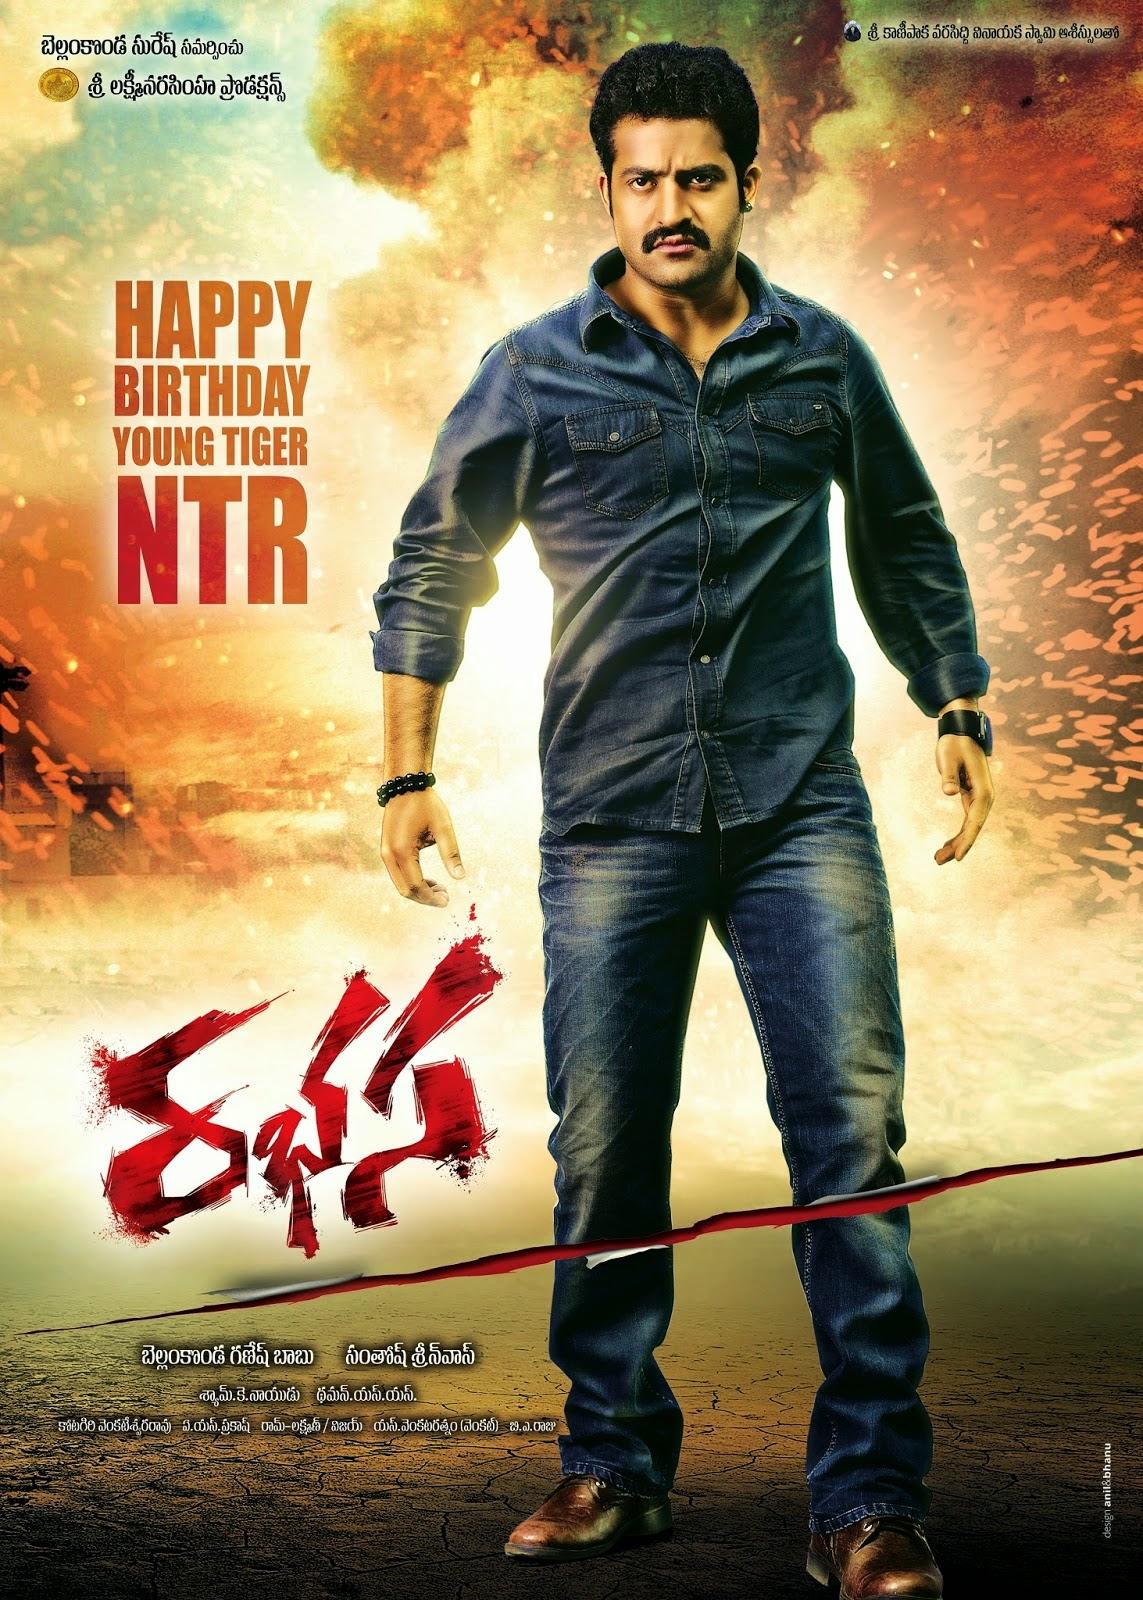 Telugu hit songs 2014 free download - www hdgpaawzquukg cf